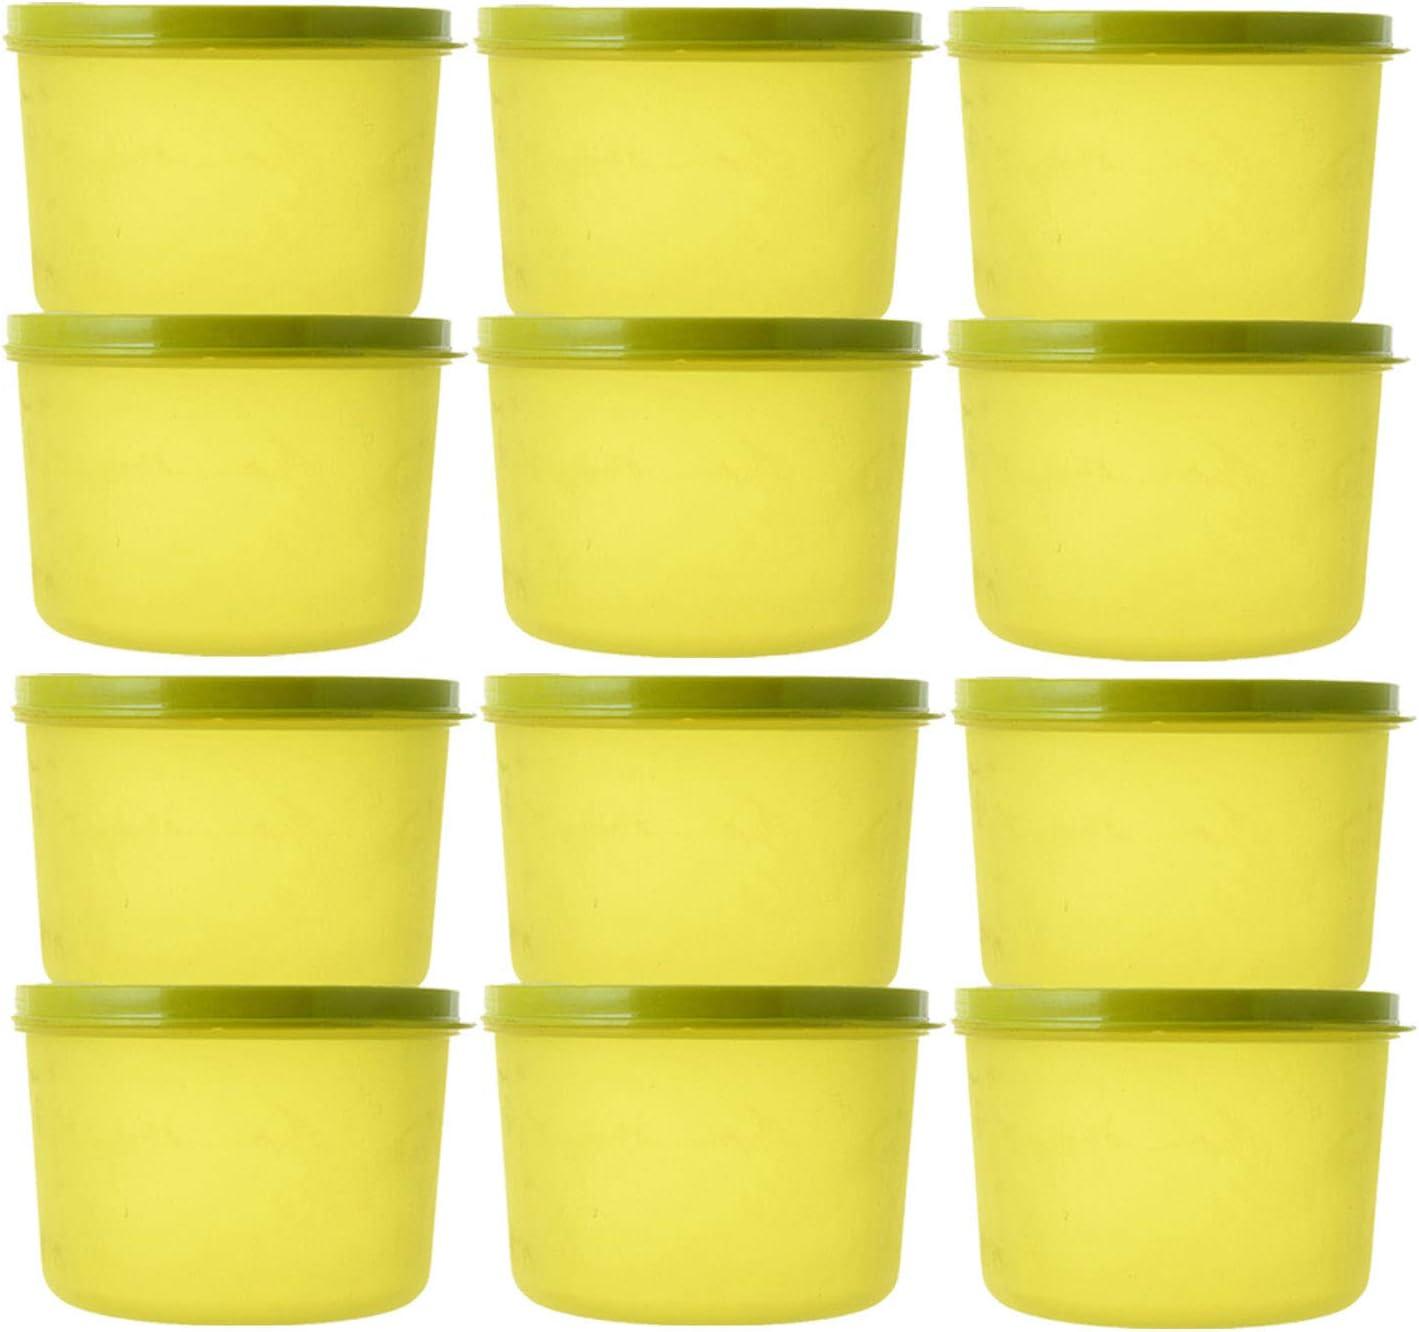 Kuber Industries Plastic 12 Pieces Kitchen Storage Spice Contain